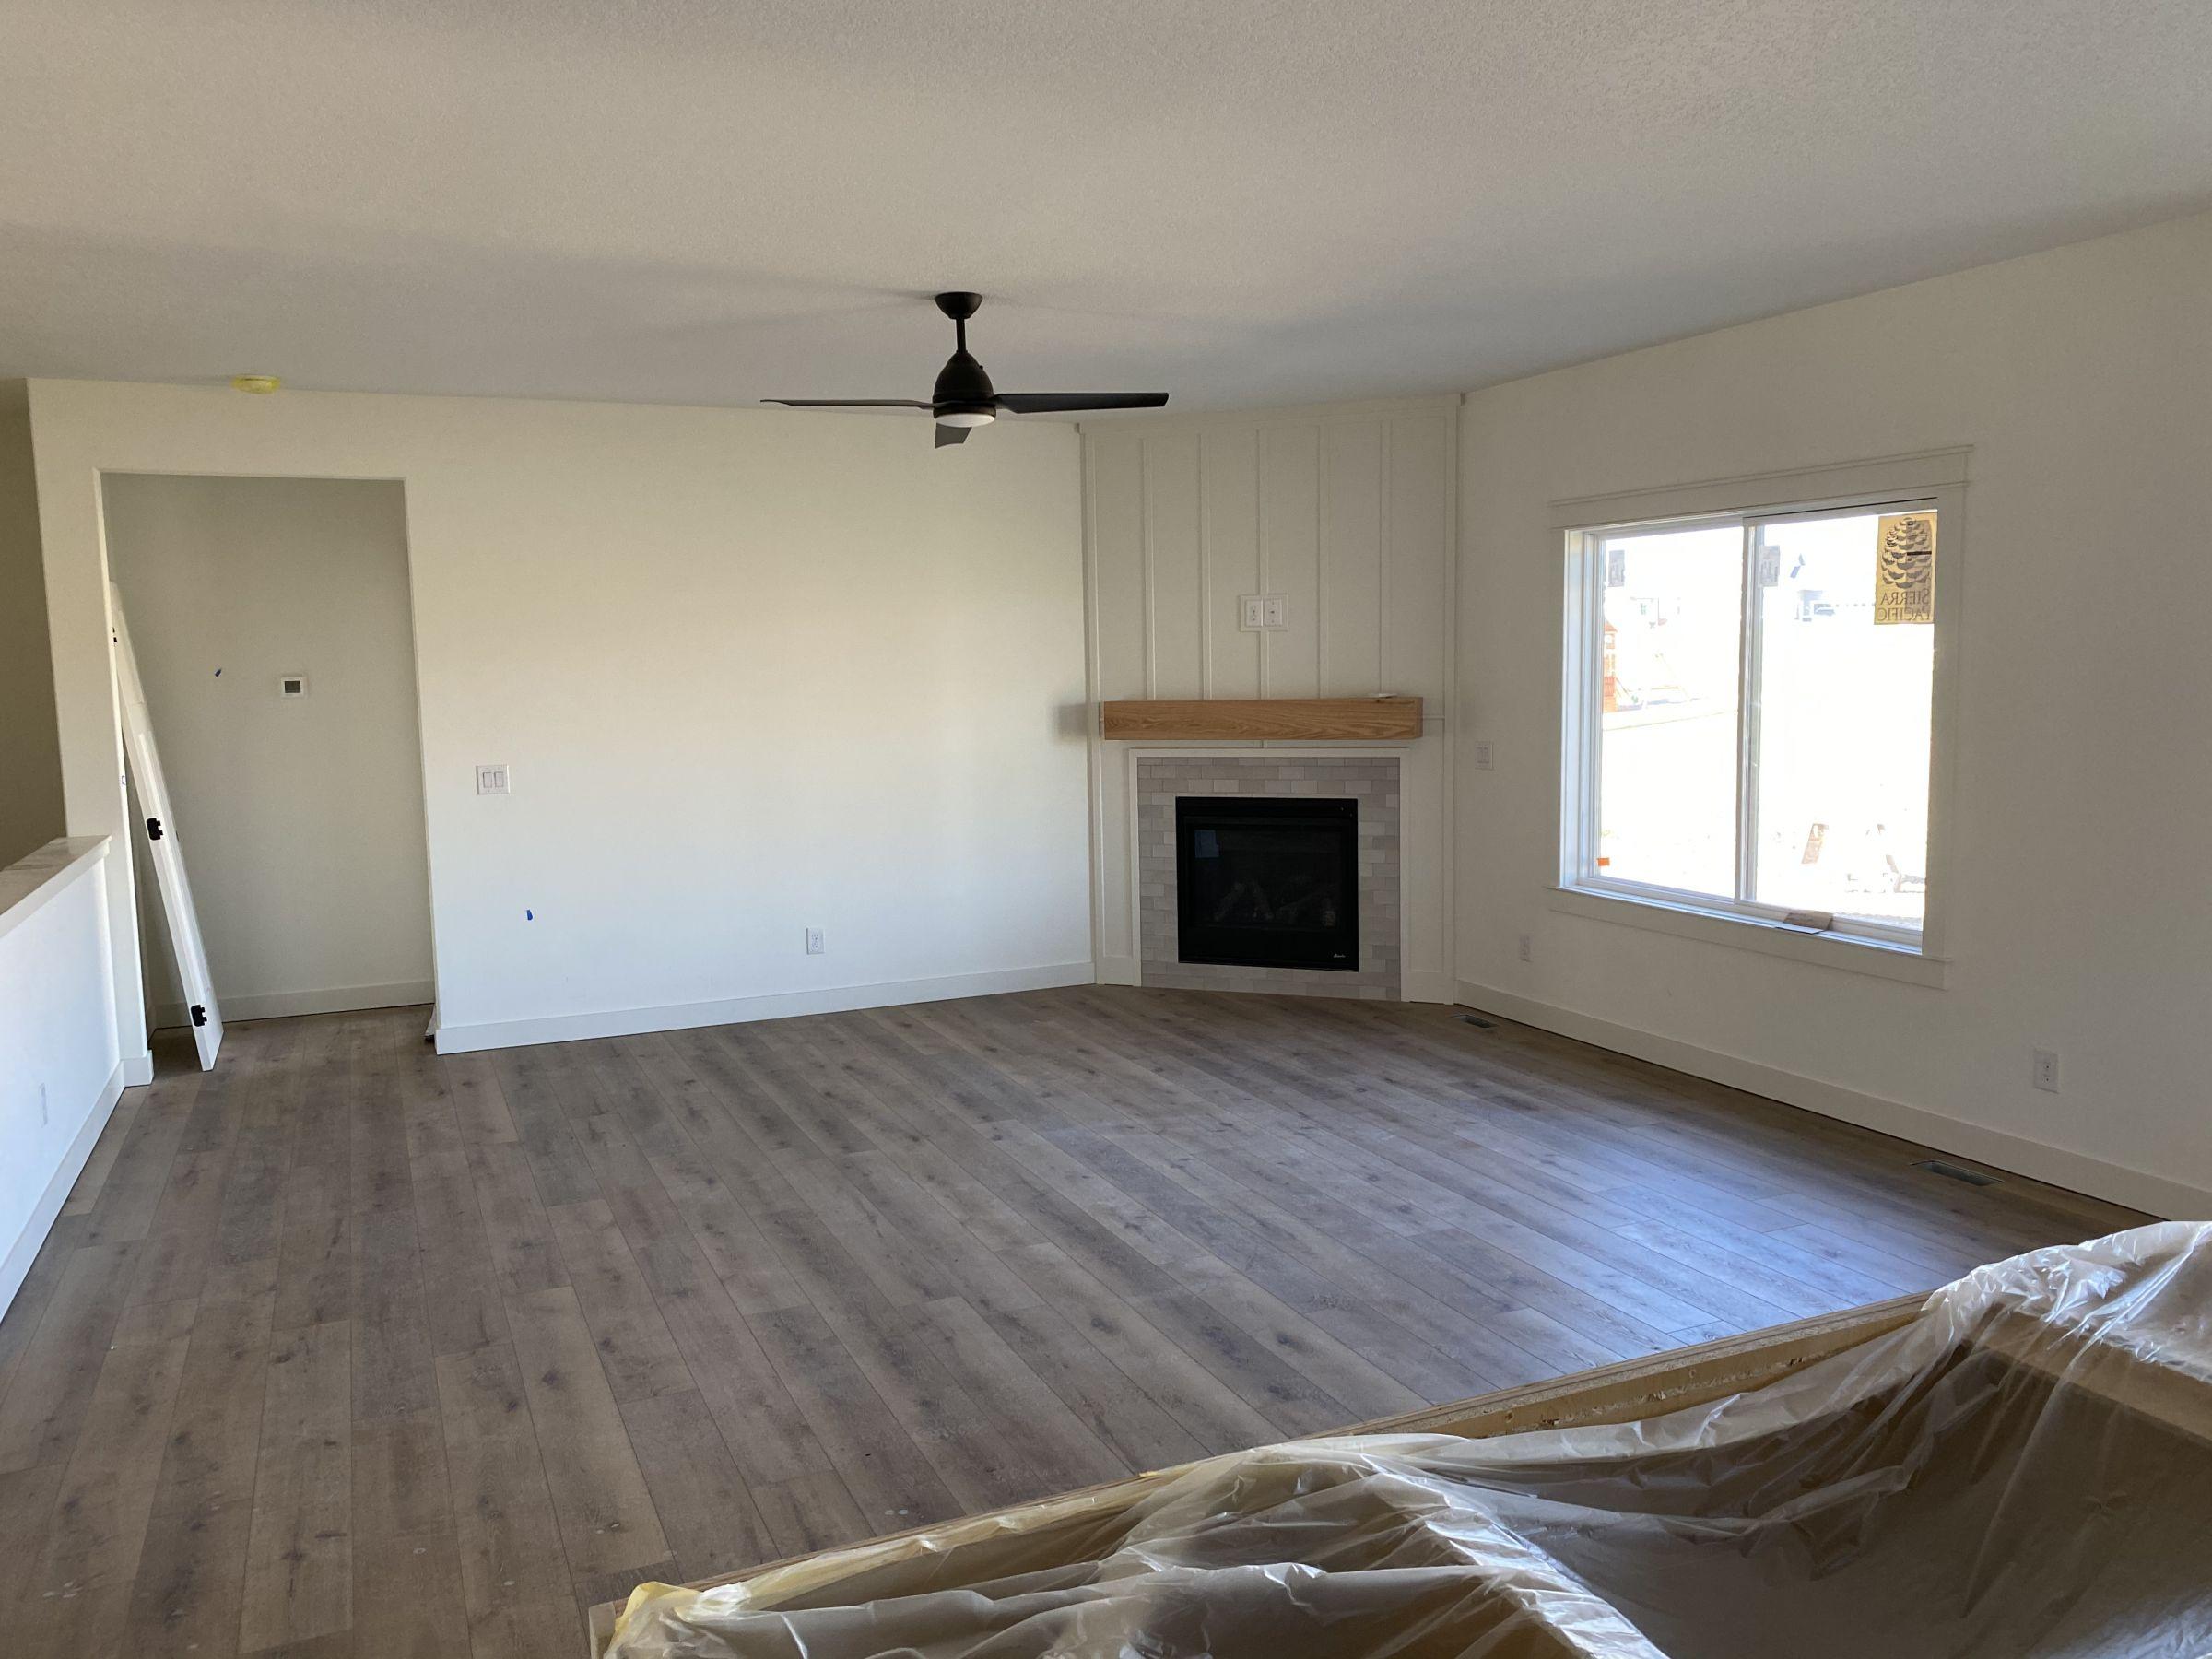 residential-warren-county-iowa-0-acres-listing-number-15095-4-2020-11-12-212721.jpg